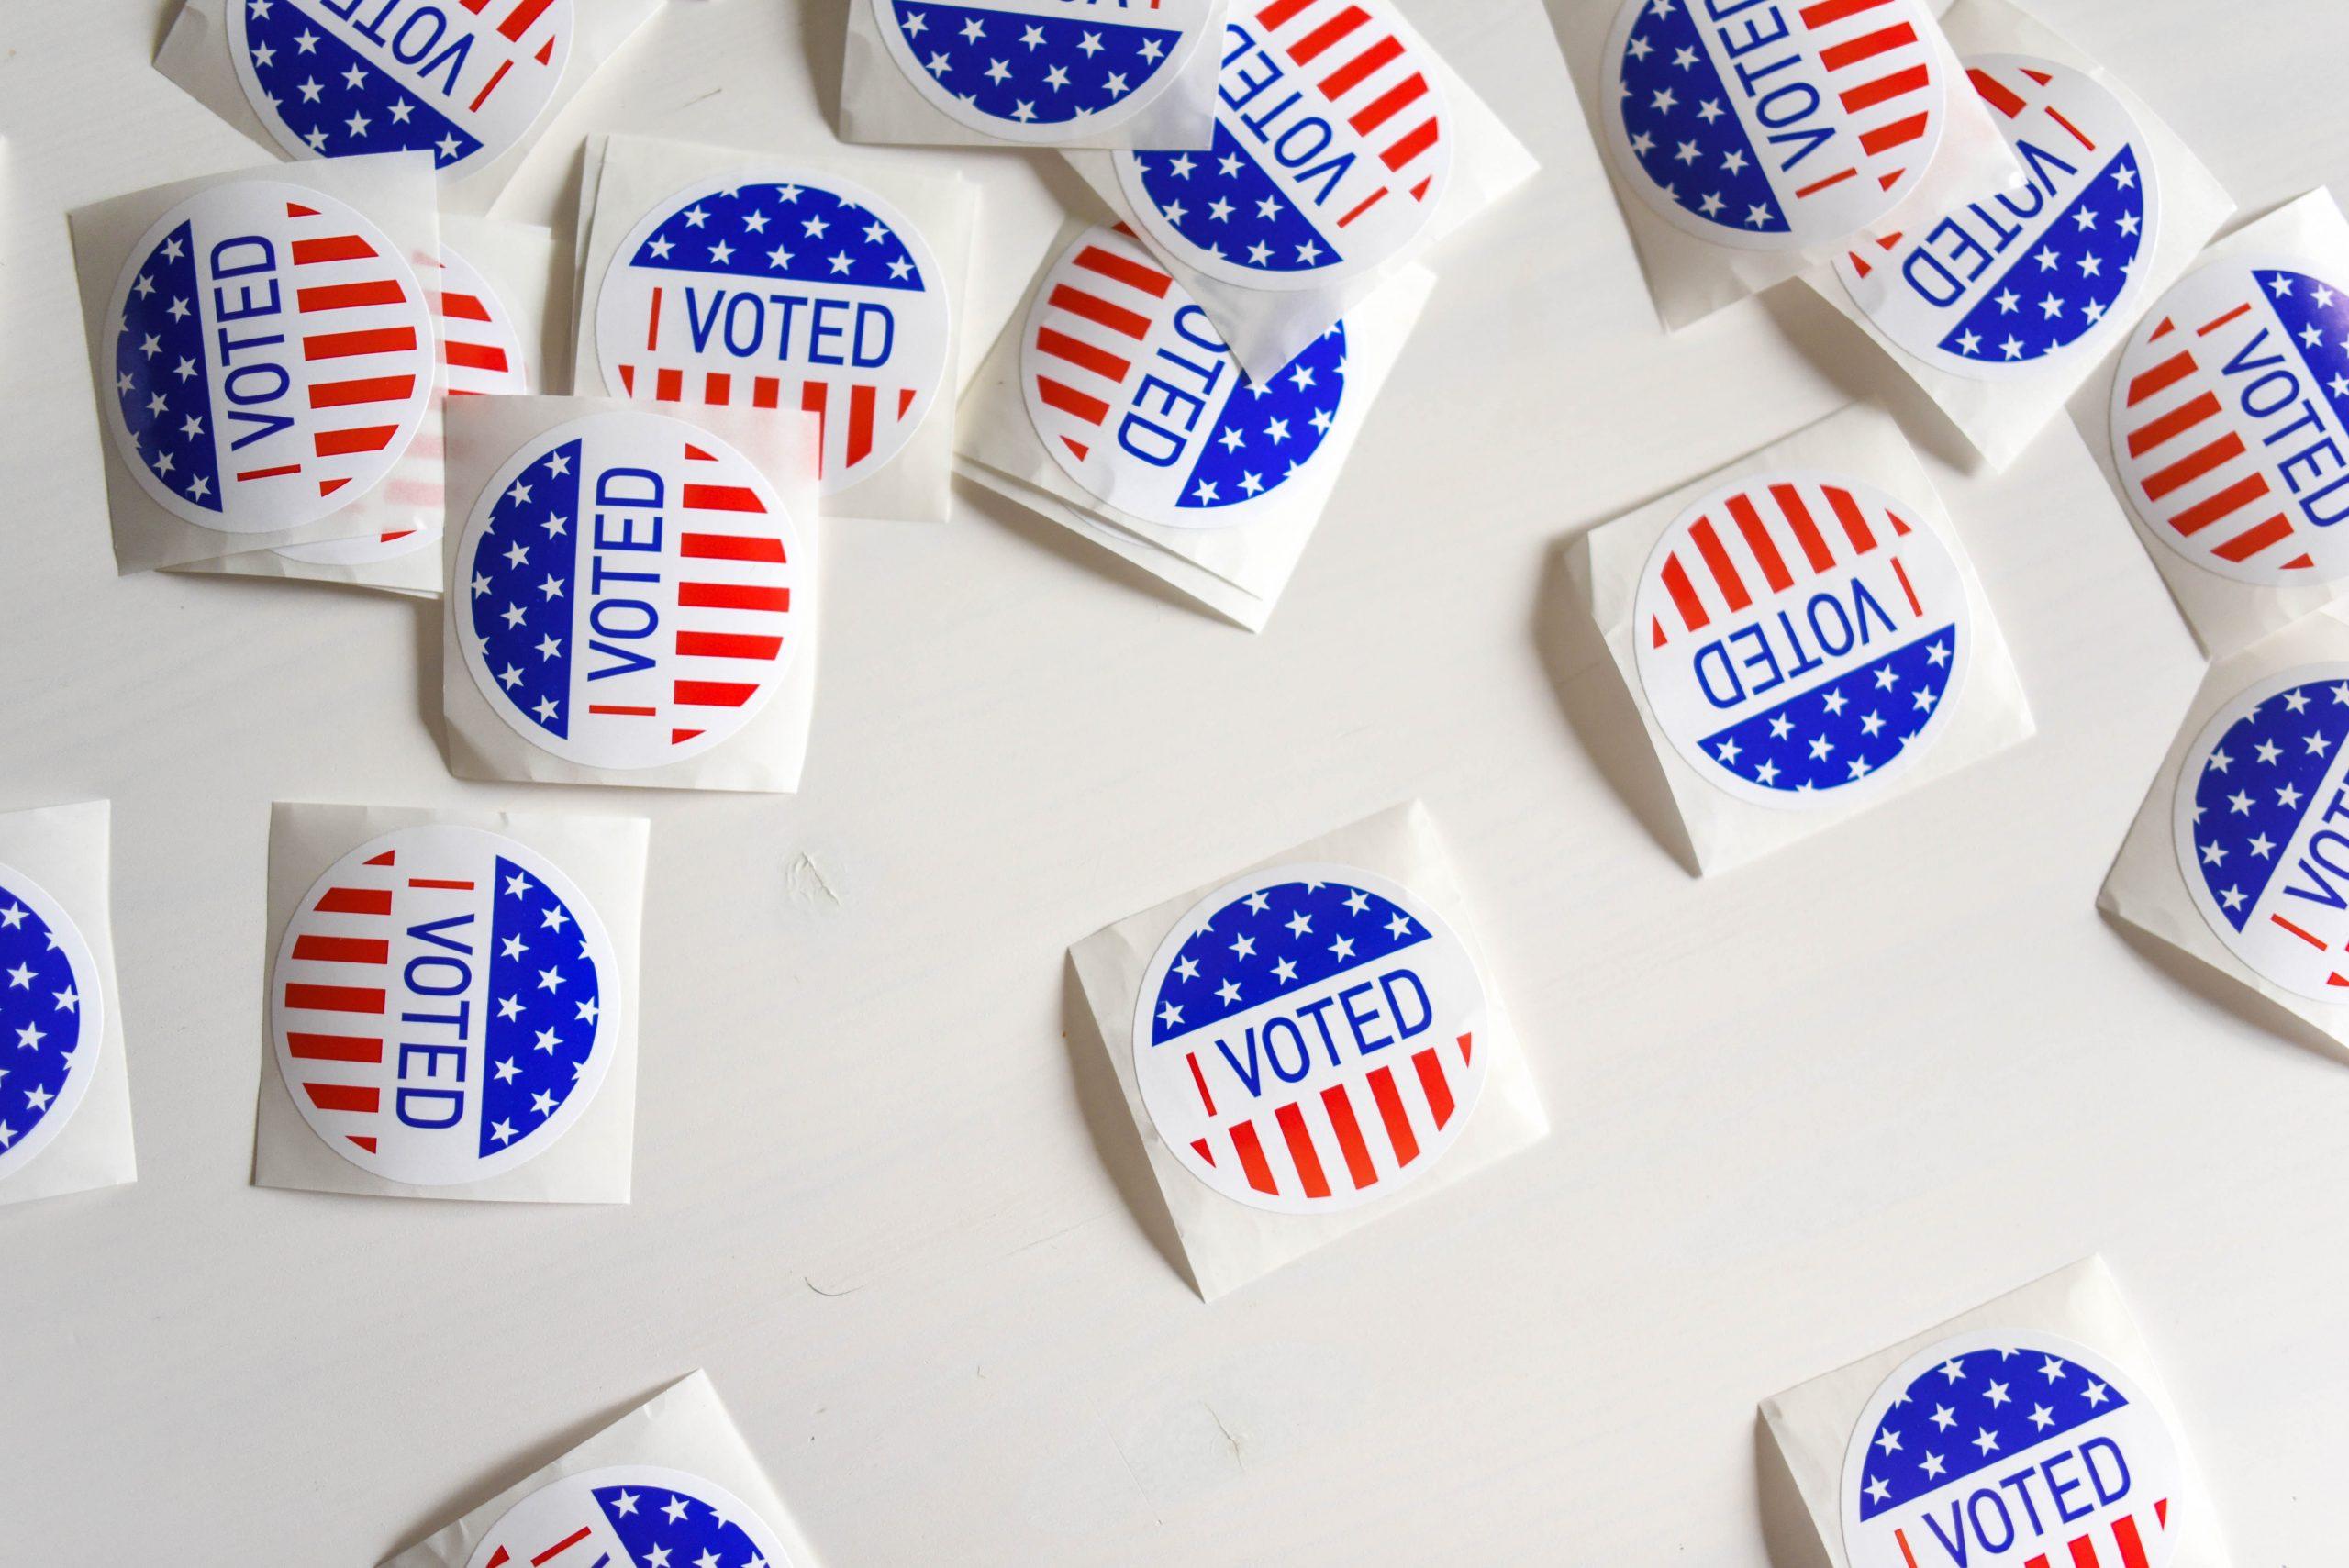 Election Day: November 3rd, 2020